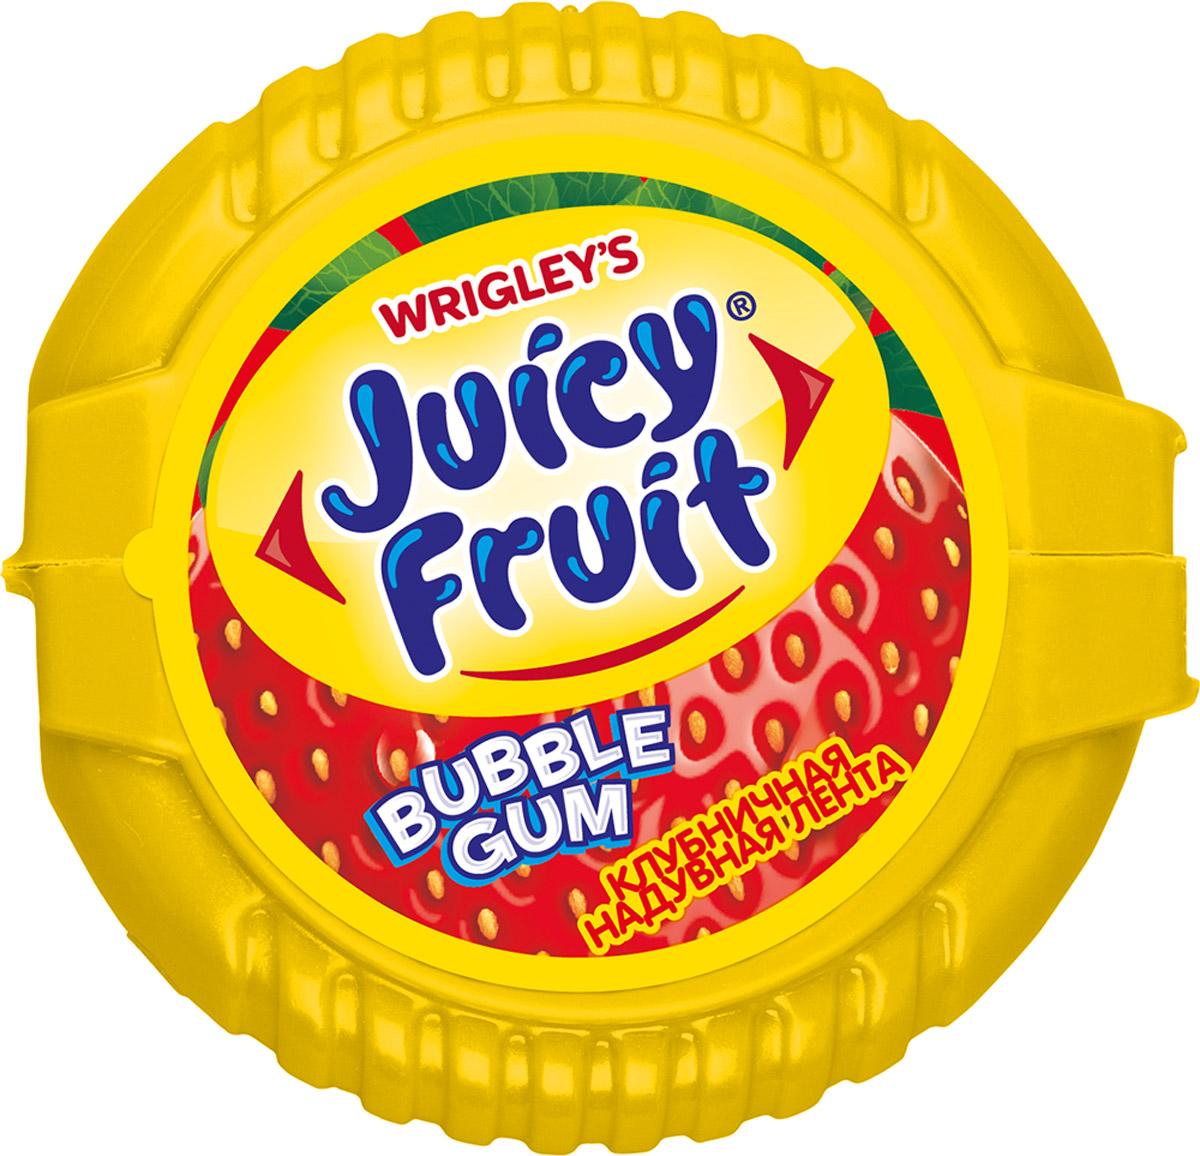 Juicy Fruit Bubble Gum Клубничная надувная лента жевательная резинка, 30 г lotte cool mint жевательная резинка 26 г